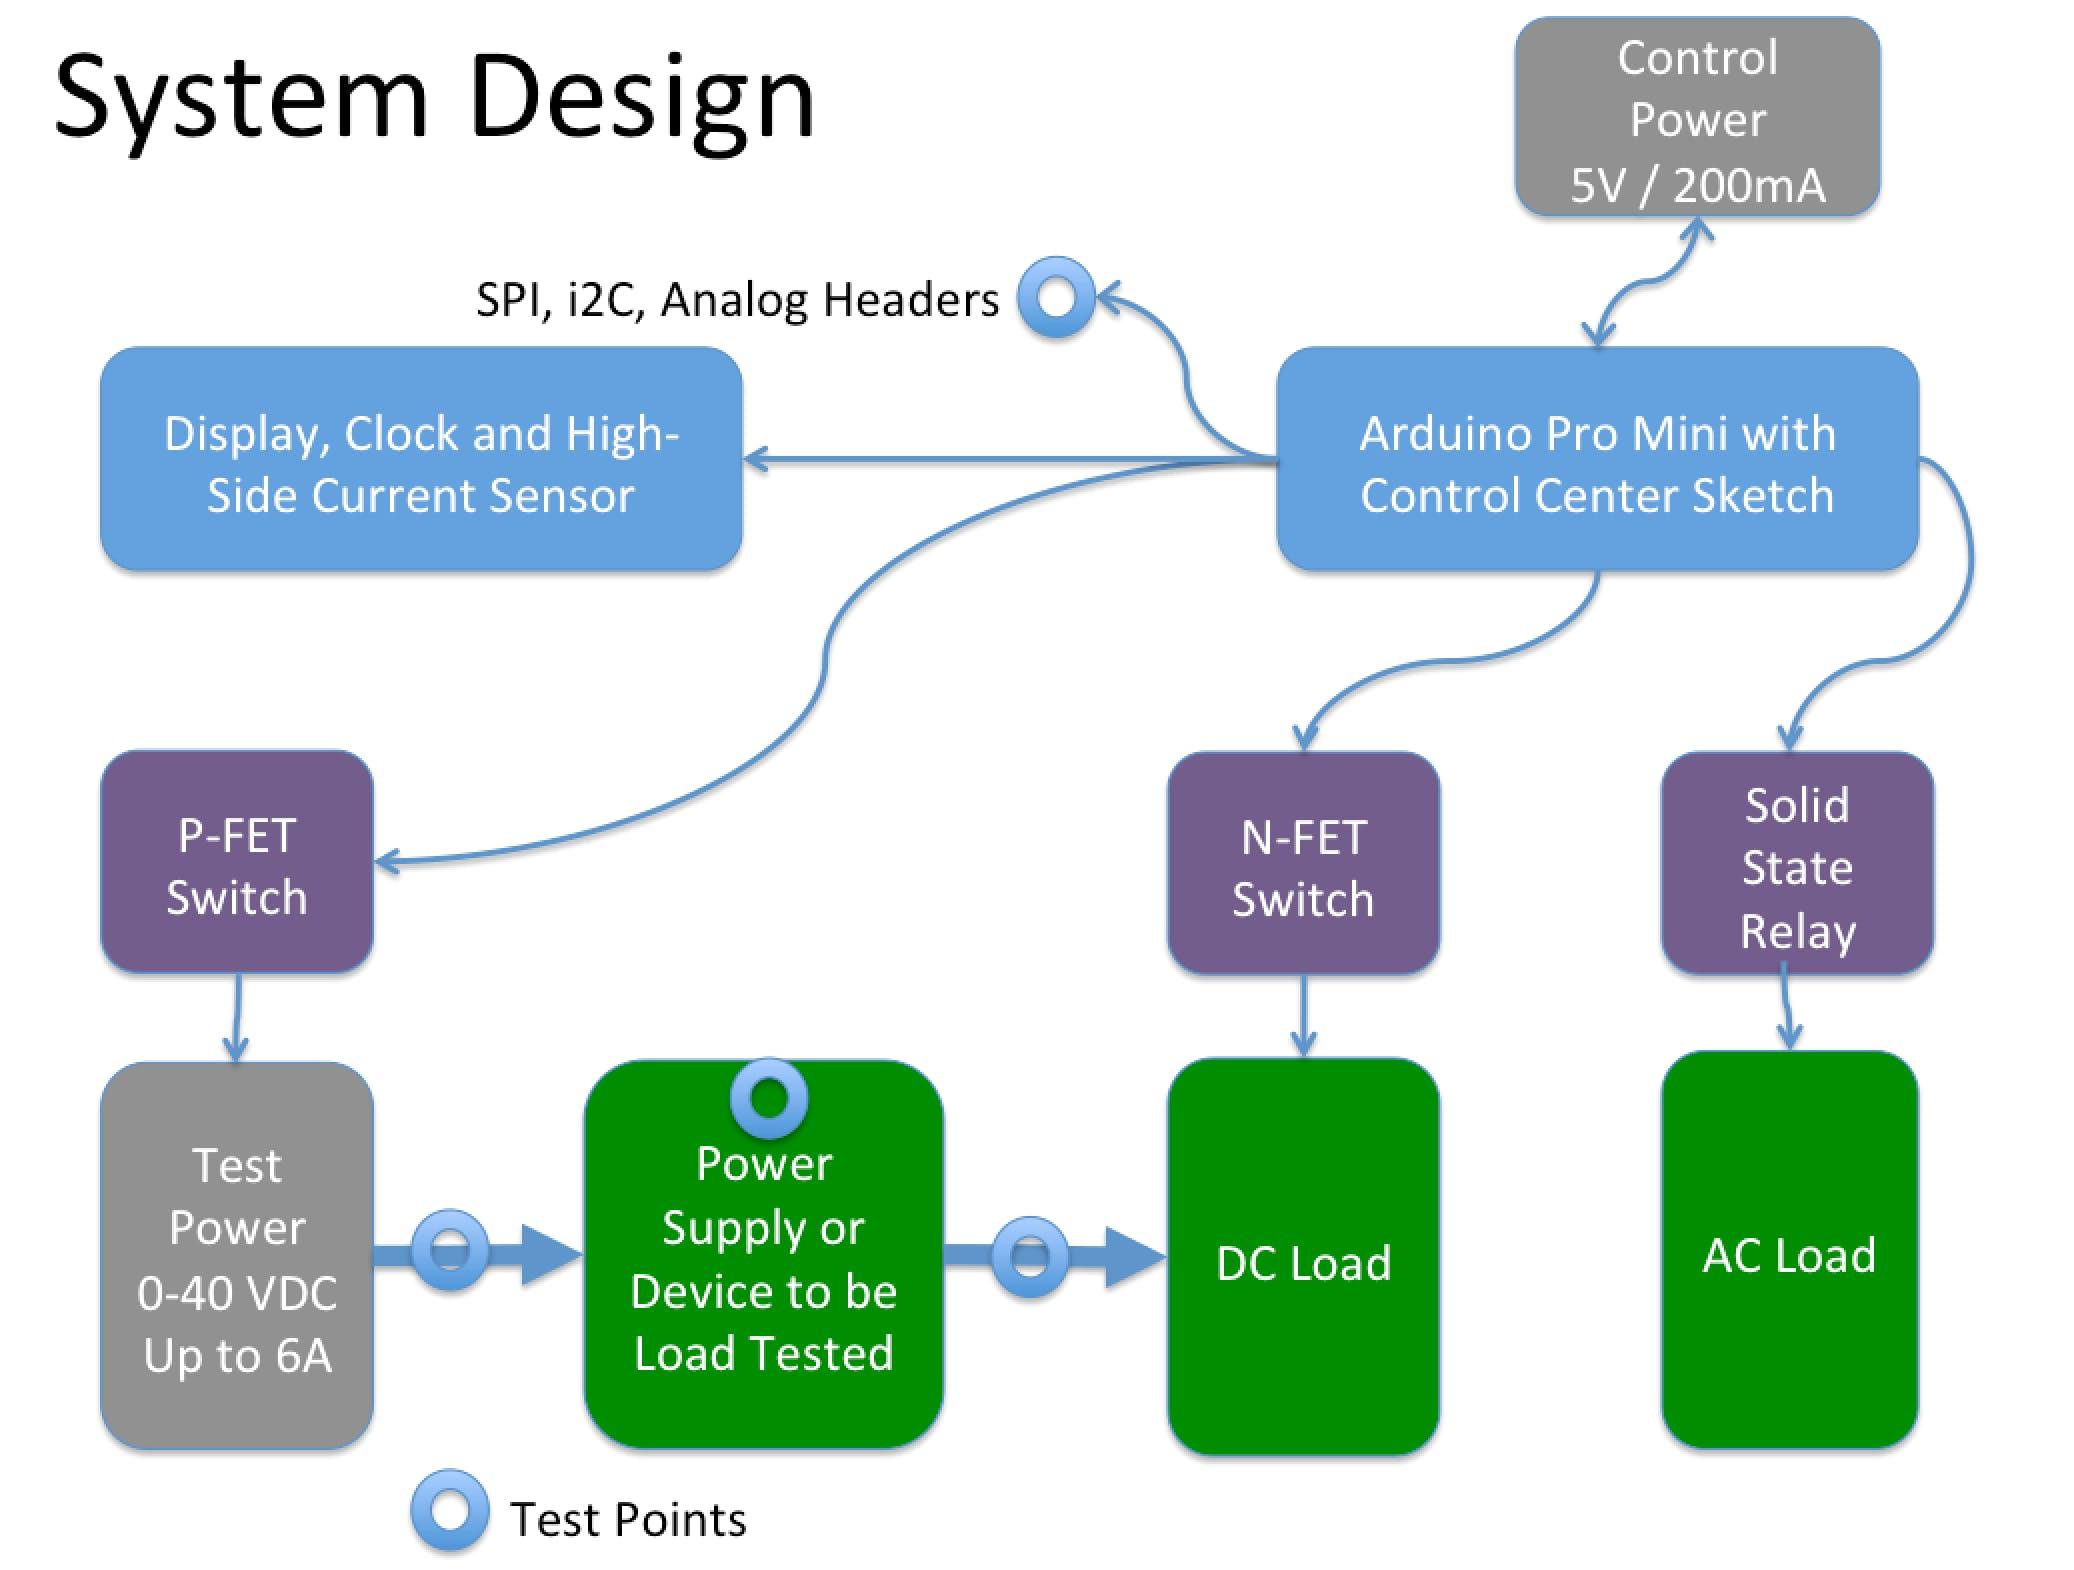 Arduino Control Center